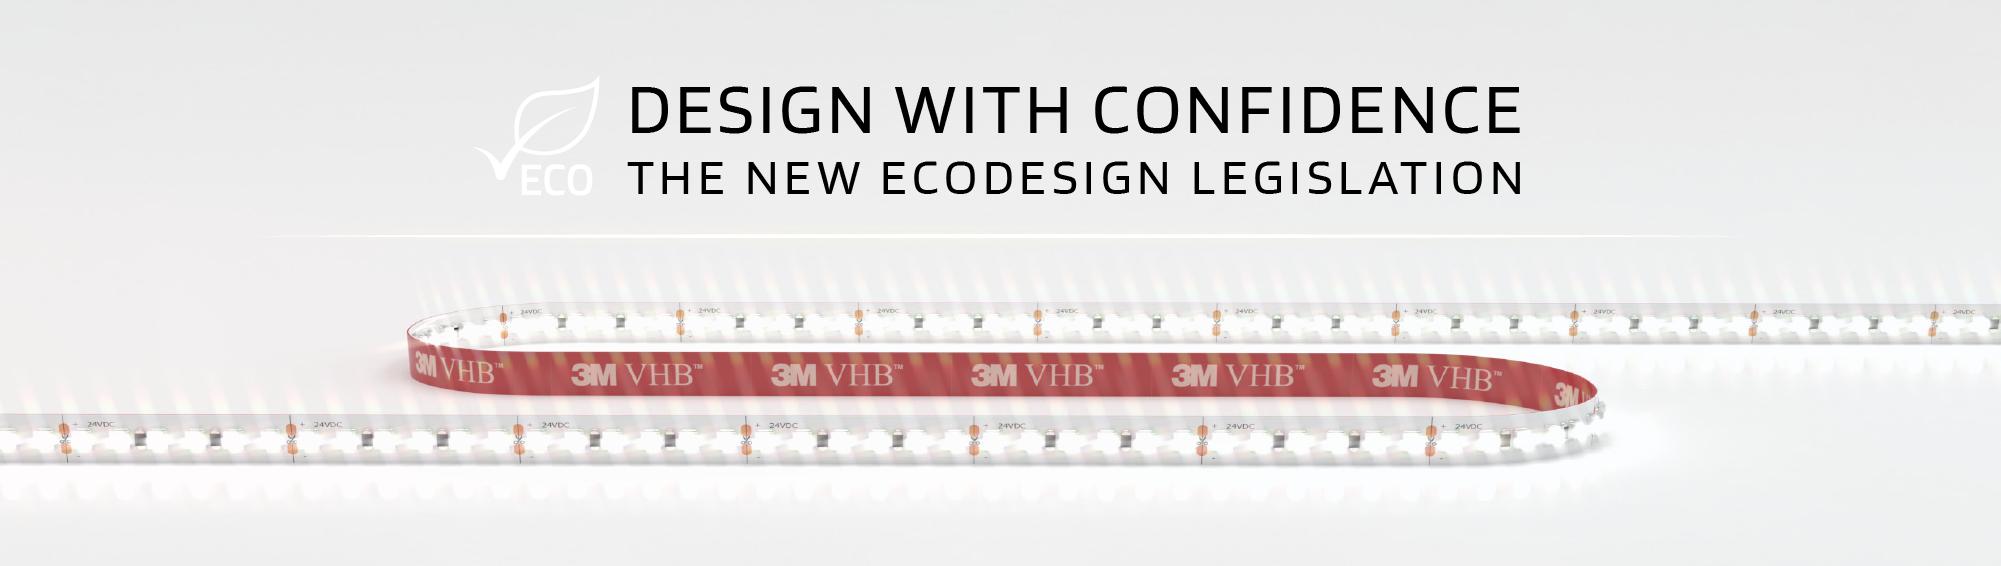 Design with Confidence - The new Ecodesign Legislation